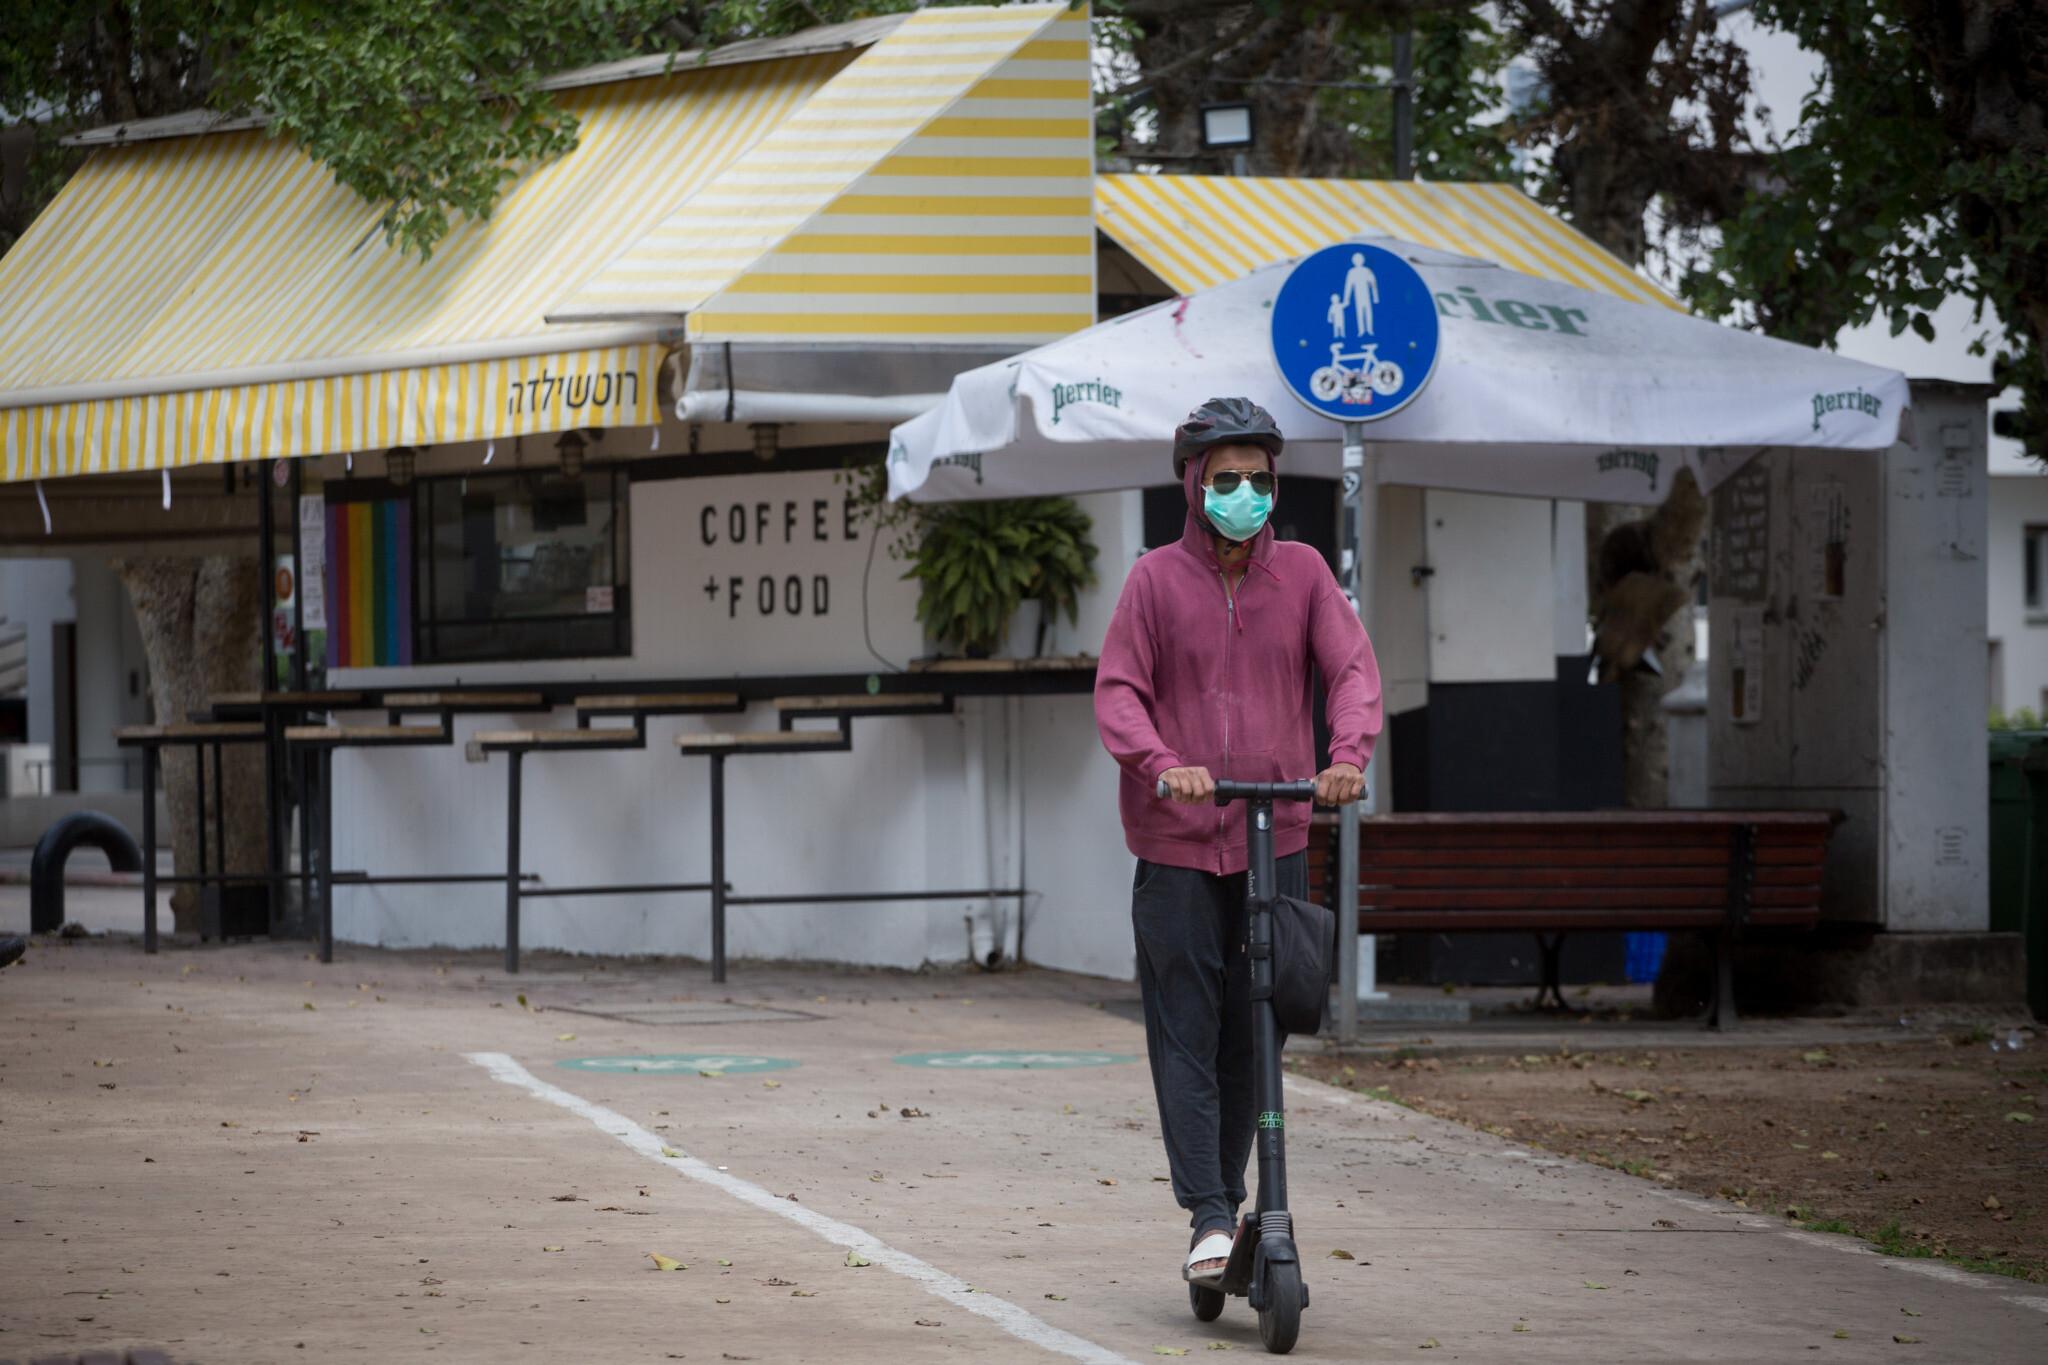 Coronavirus: After Delhi & Maharashtra, Telangana also makes masks mandatory while going out